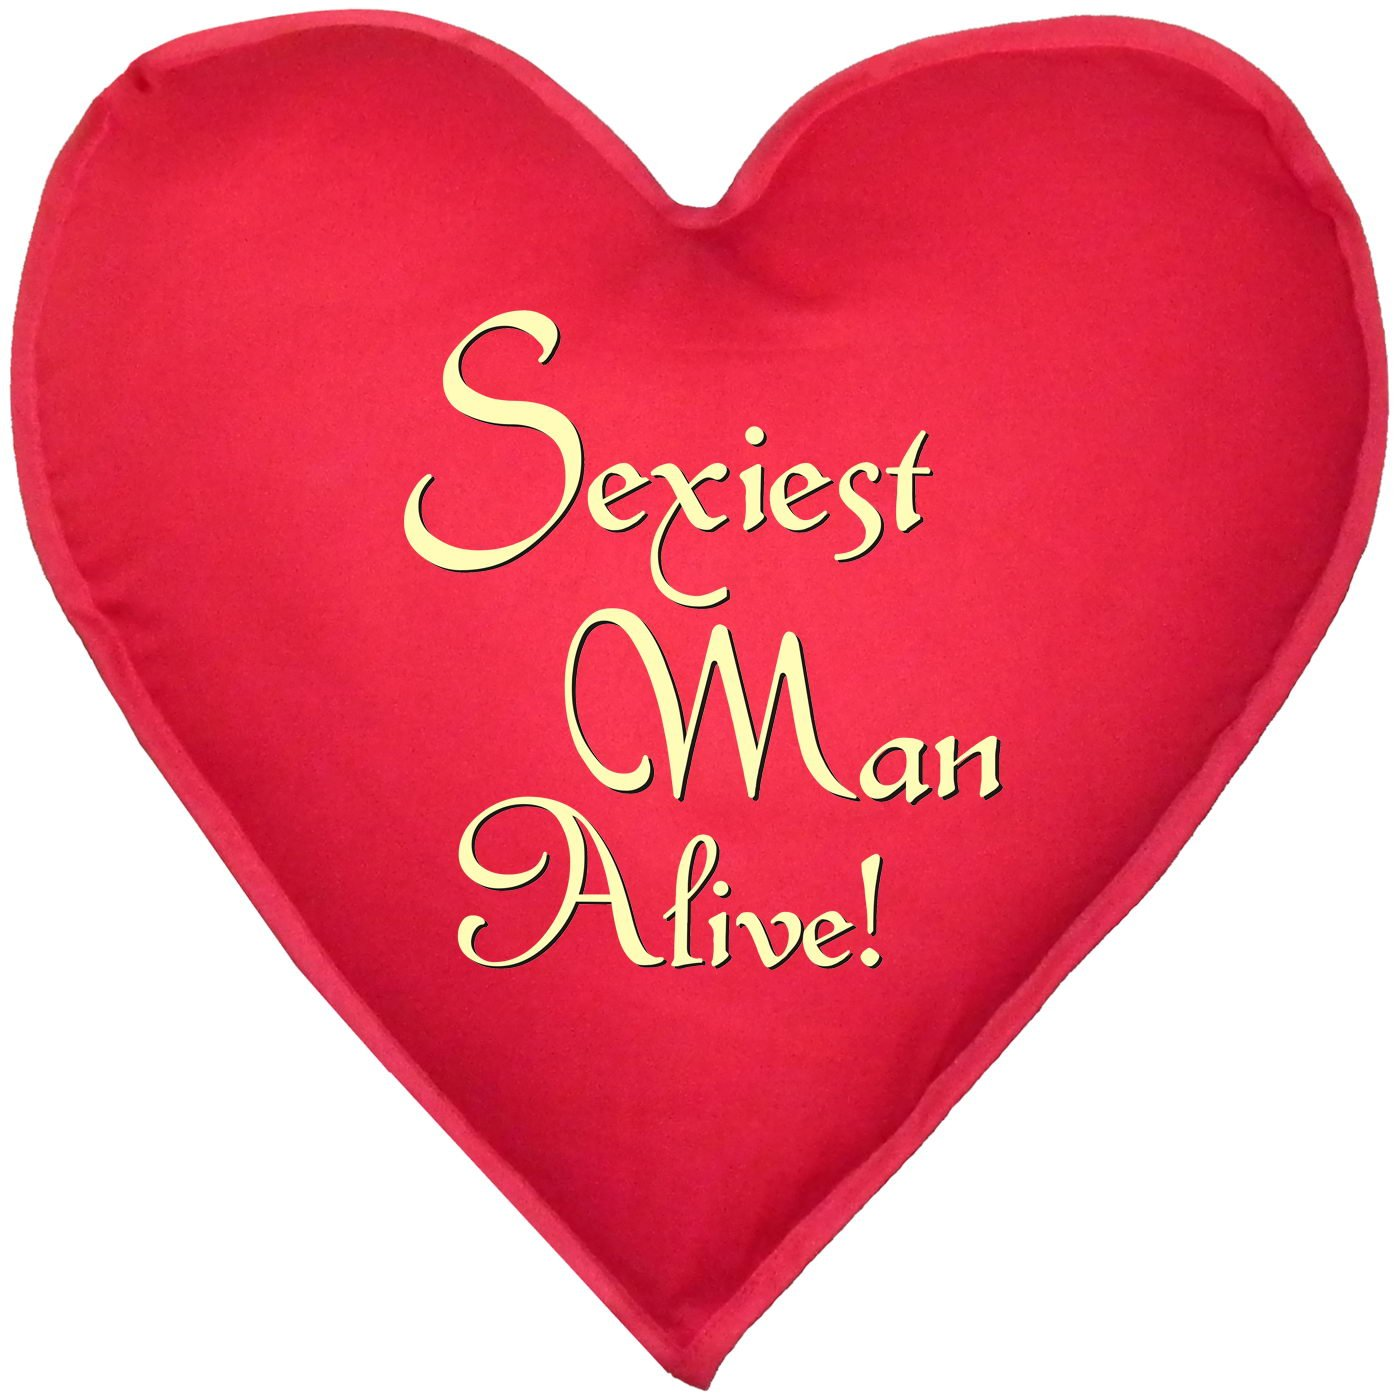 sexy kissen in herzform sexiest man alive originelles geschenk f r ihn ca 40x40cm online. Black Bedroom Furniture Sets. Home Design Ideas